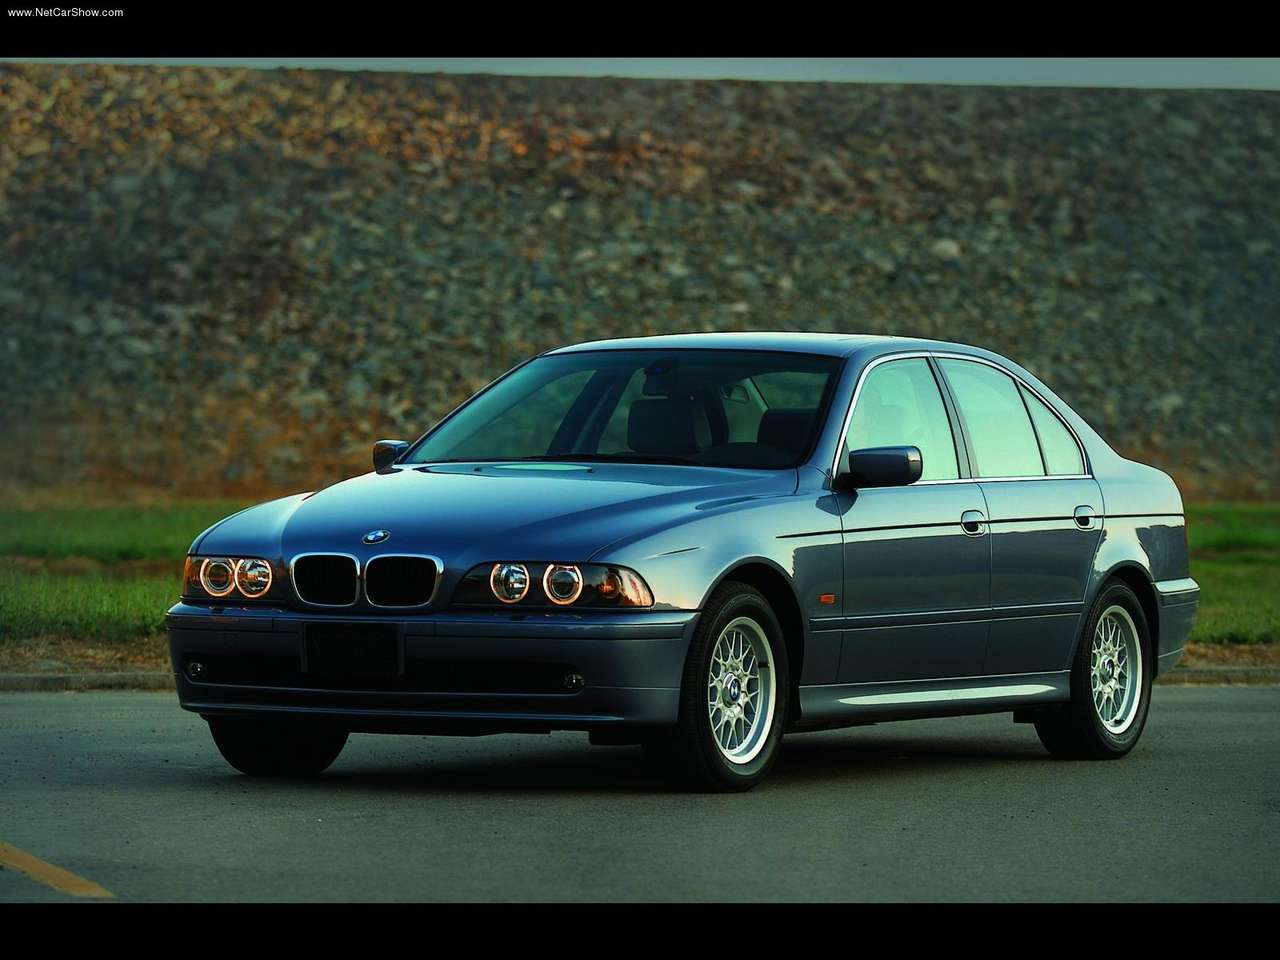 http://2.bp.blogspot.com/_vPMjJG-enrk/TBTjF4V8EmI/AAAAAAAADHk/HupHik1vxJ8/s1600/BMW-525i_2001_1280x960_wallpaper_03.jpg